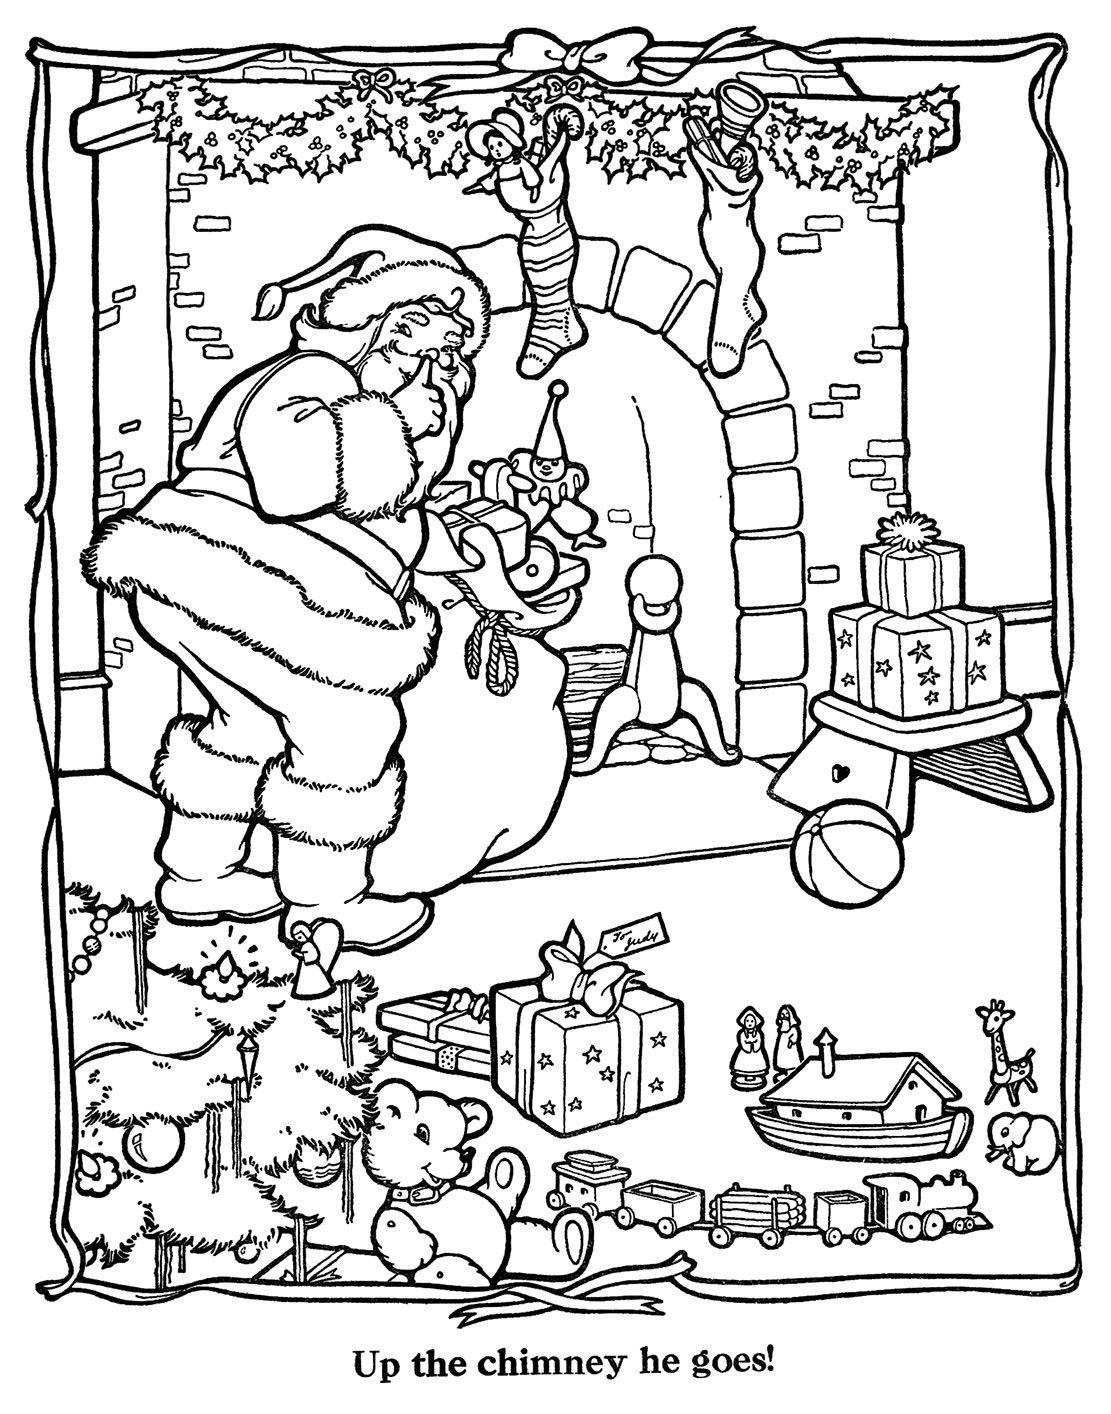 Kerst Kleurplaten Merry Christmas.Merry Christmas Paint Book 31 Kleurplaten Kleuren En Kerstman